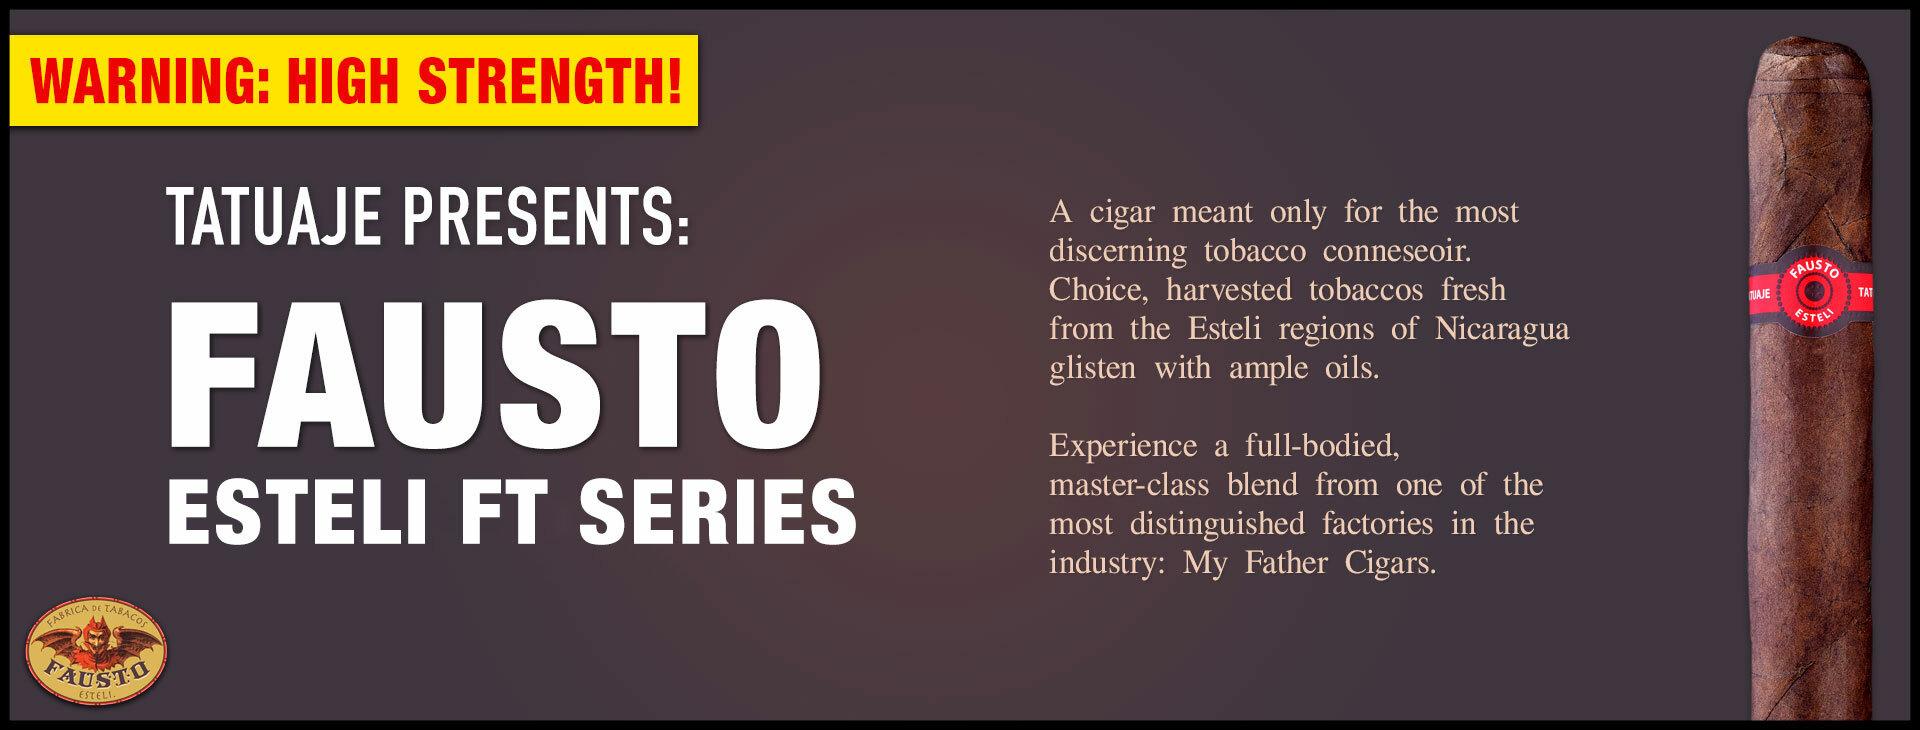 Tatuaje Fausto High Strength 10-Pack